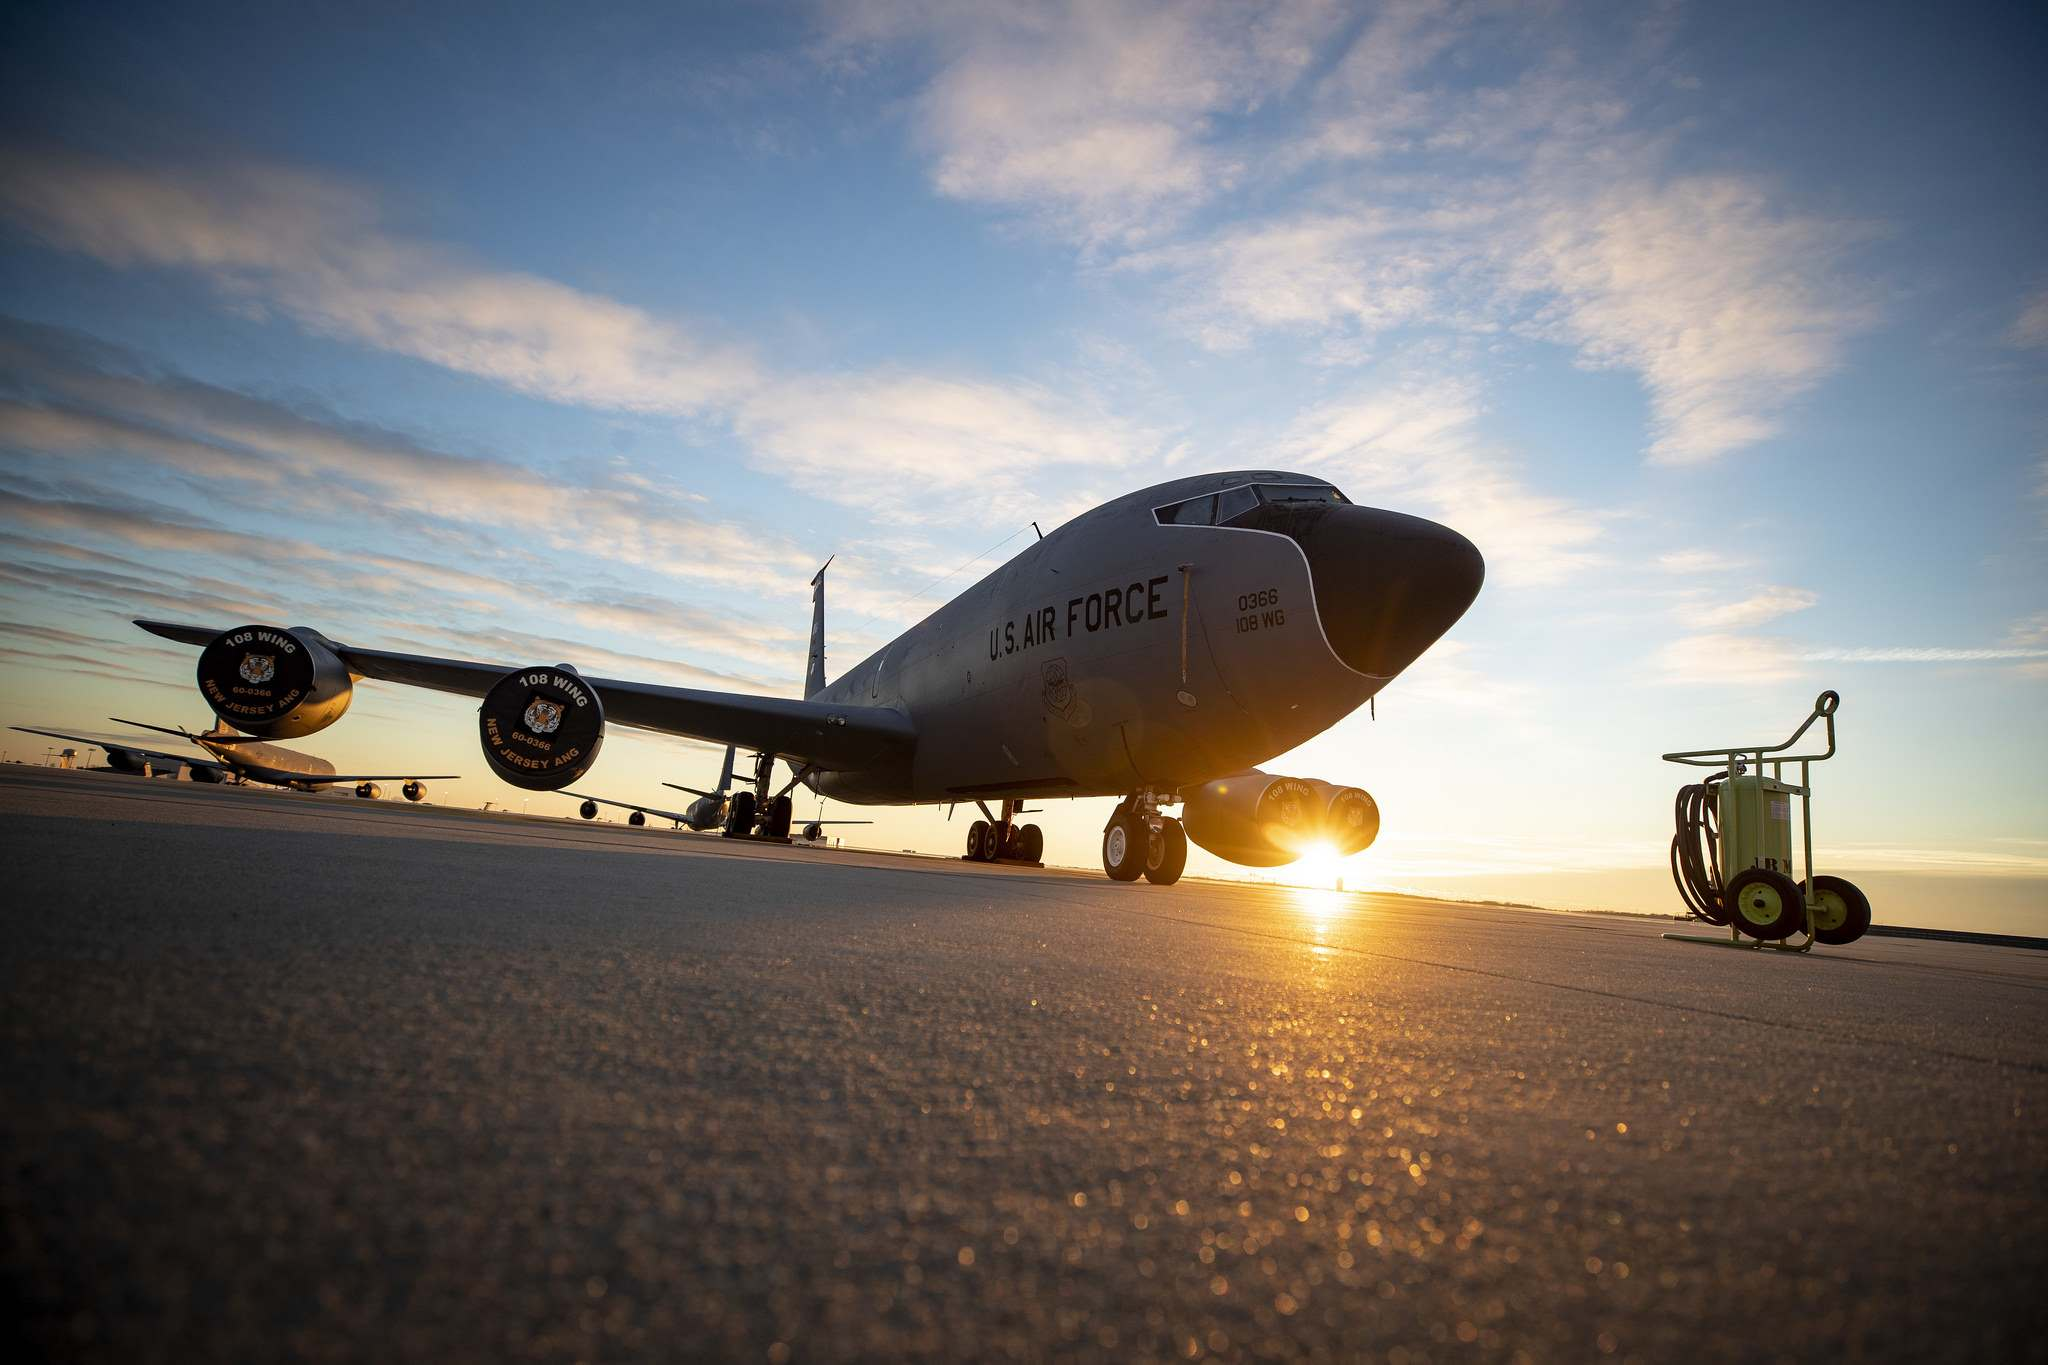 boeing kc 1353 Boeing KC 135R Stratotanker Photos